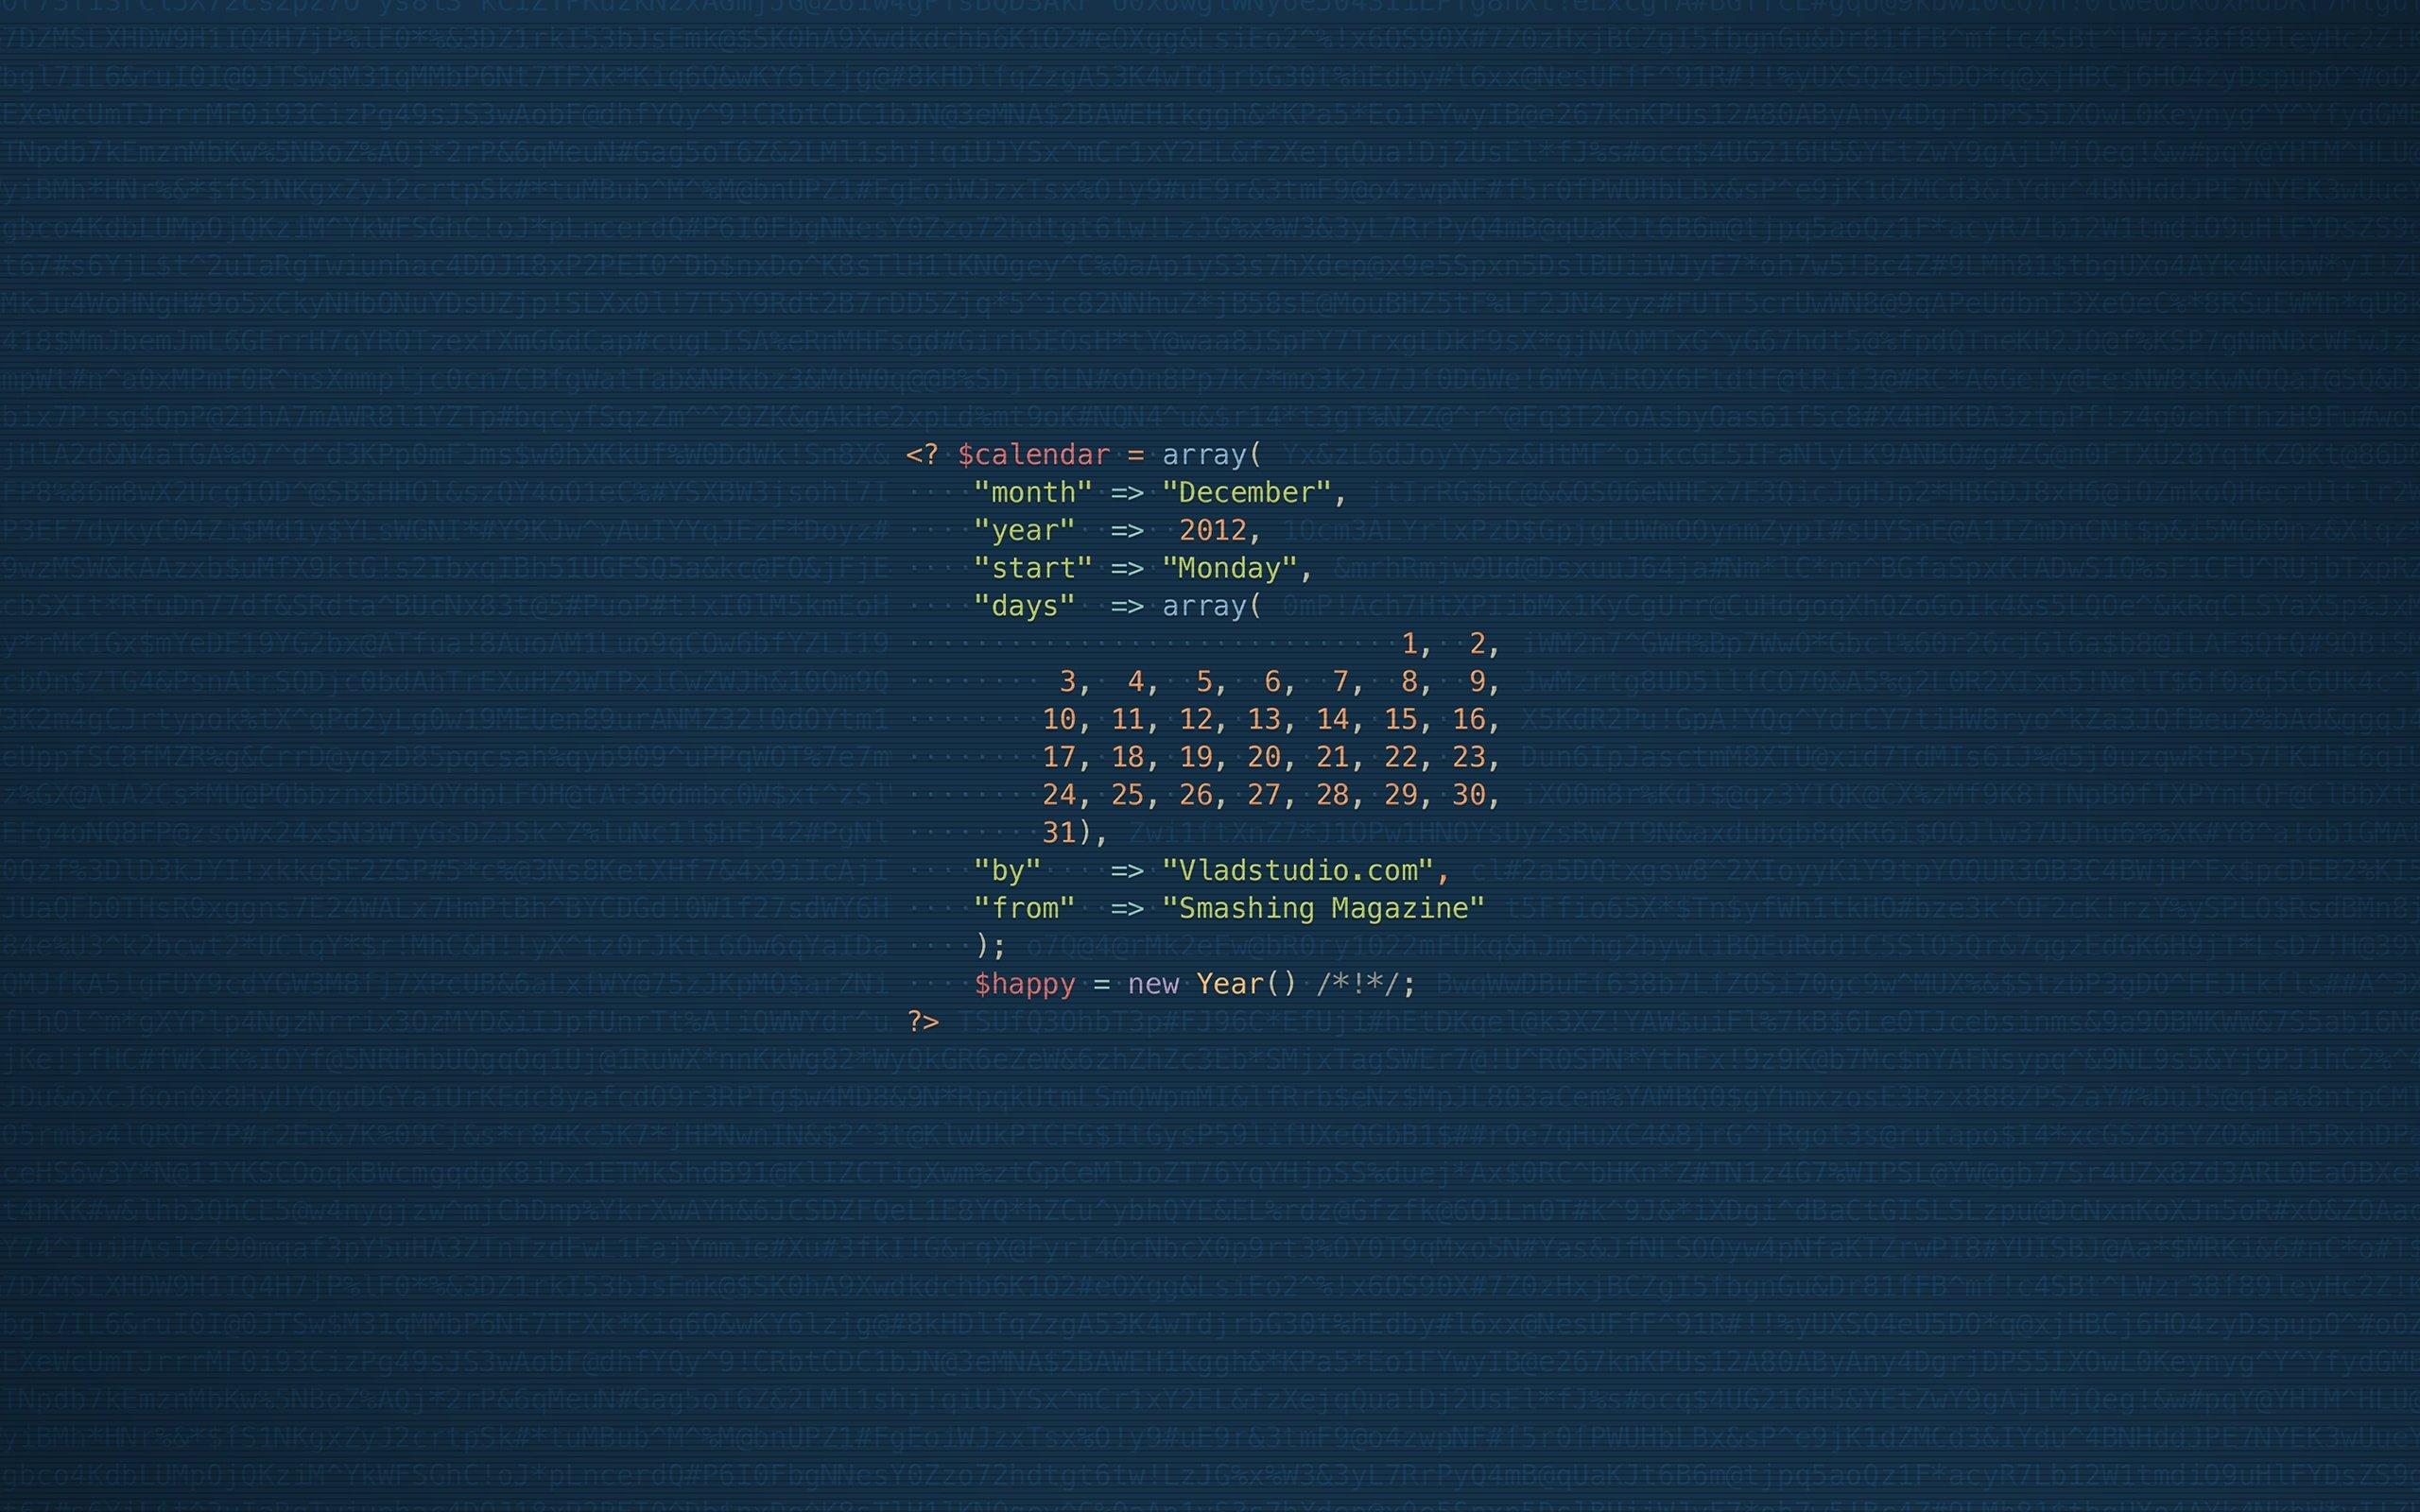 Intelligent Programing Code Wallpapers 2560x1600